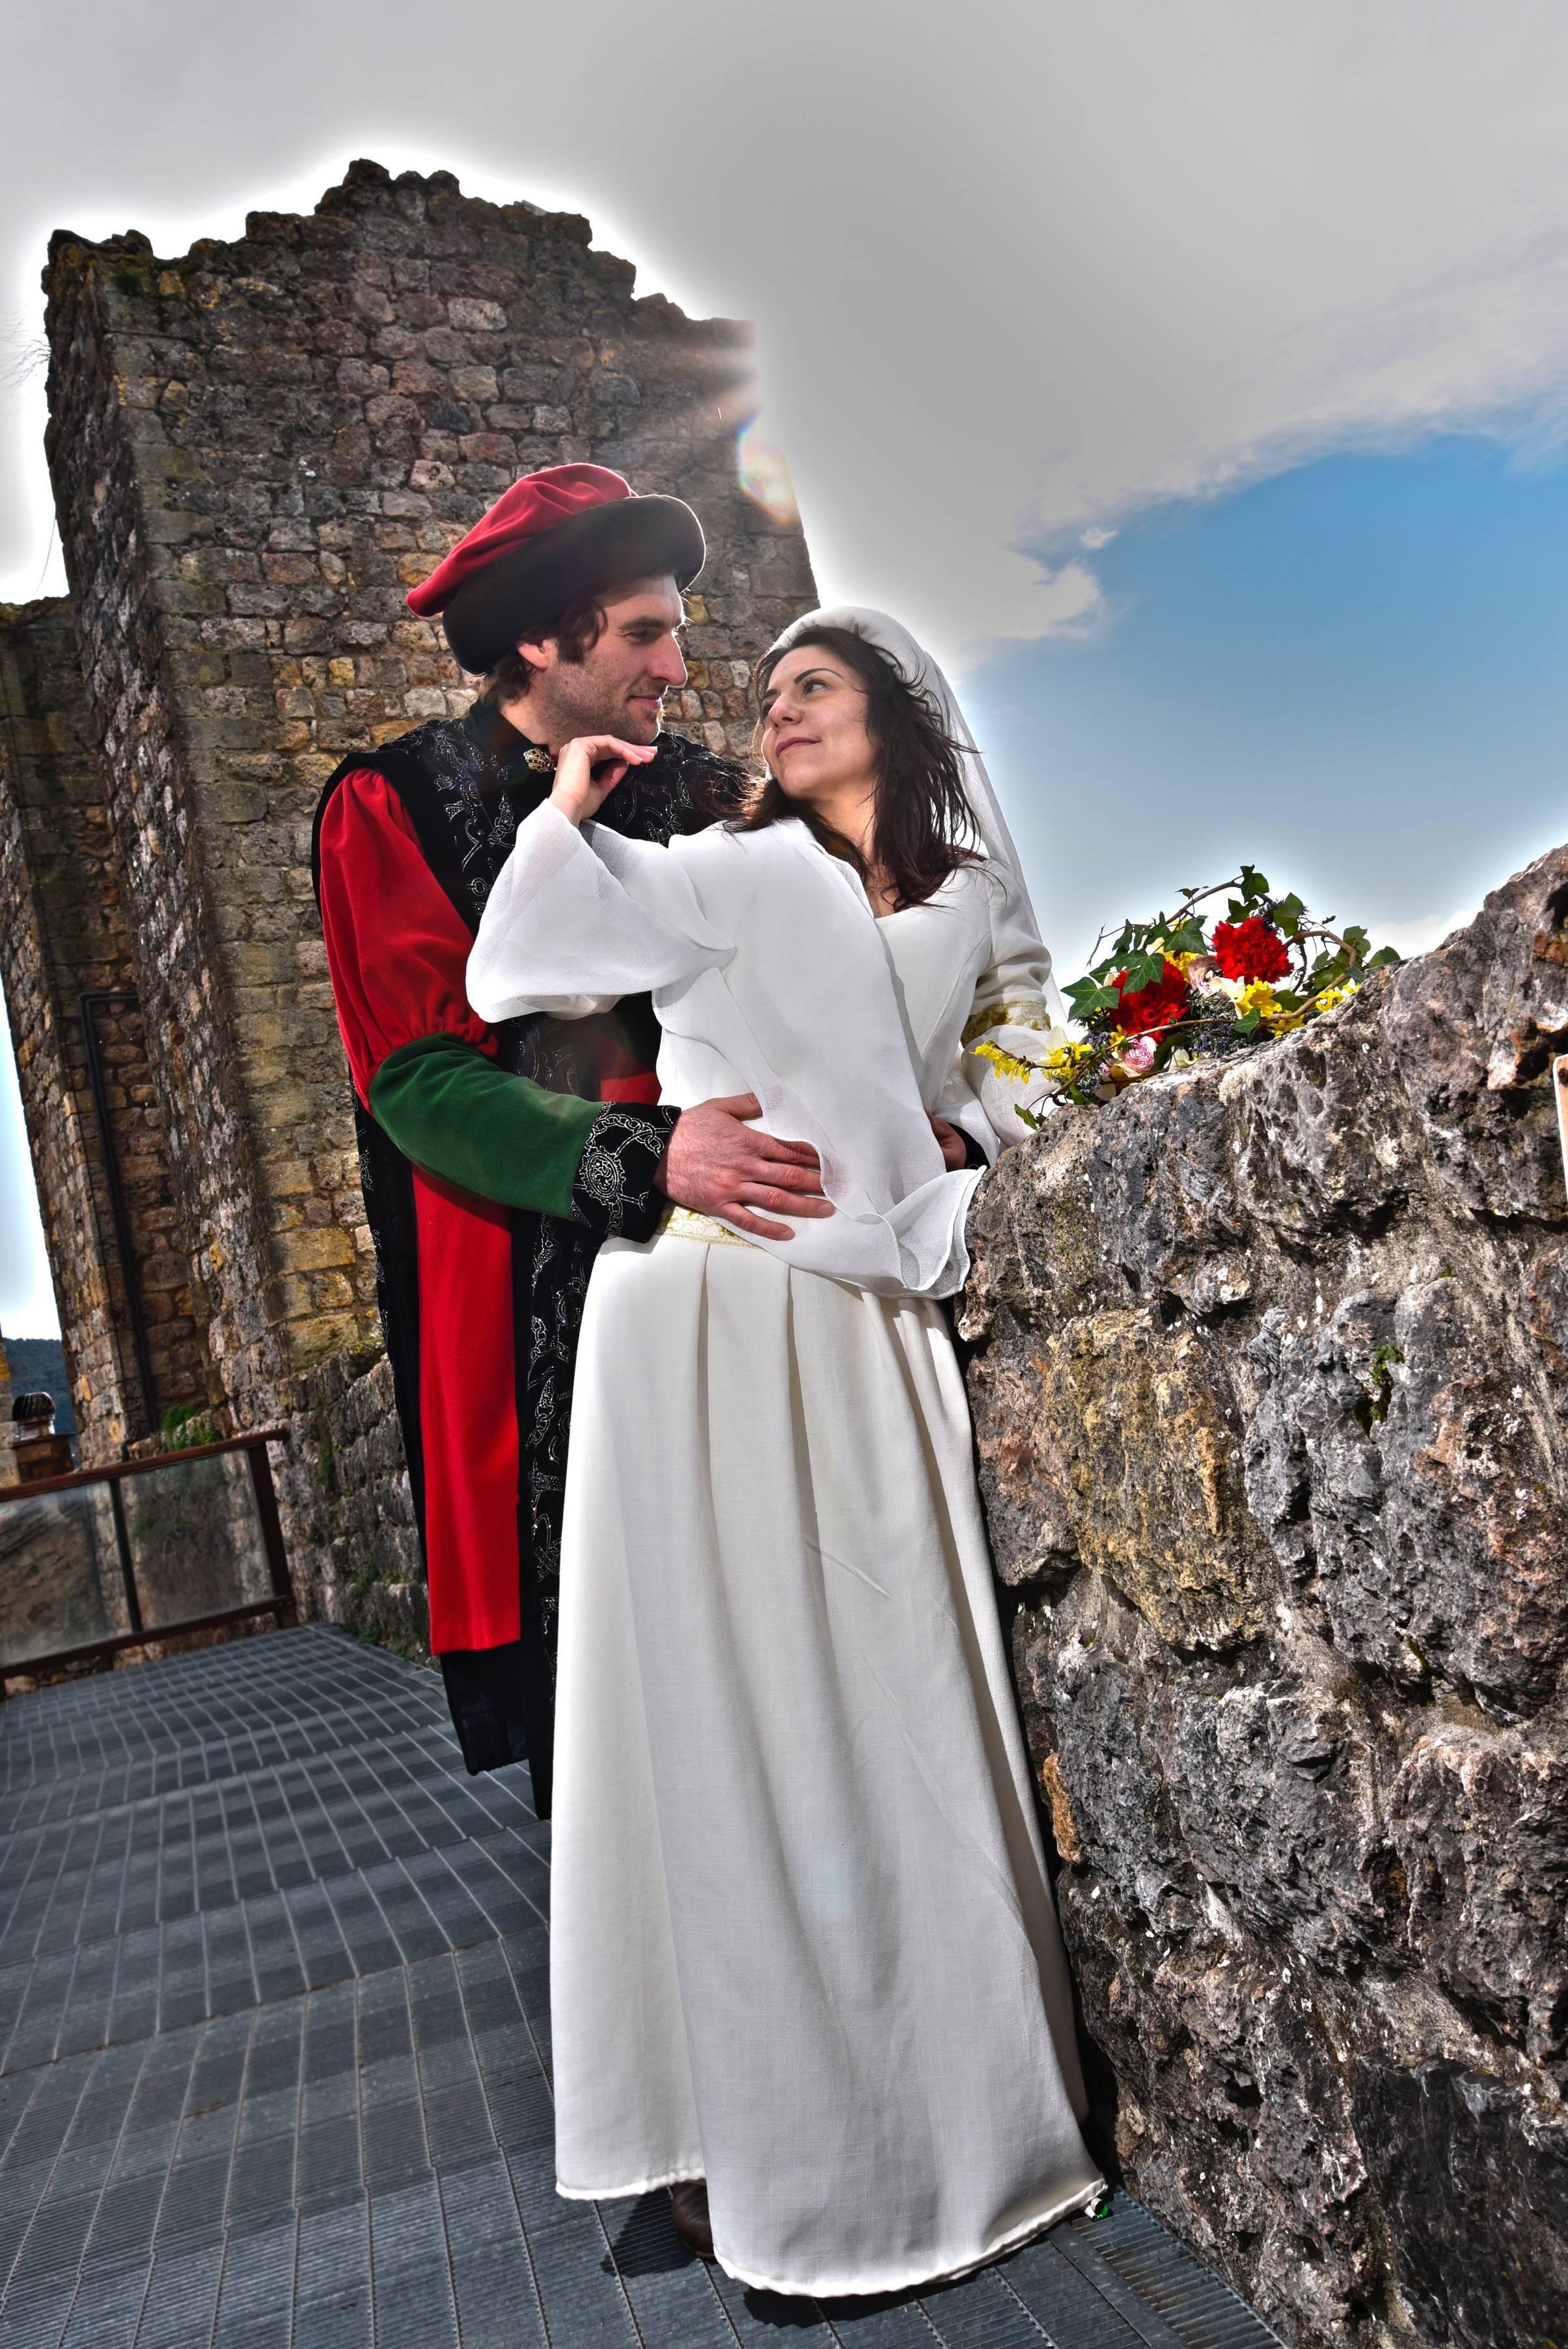 medieval wedding ceremony - HD2409×3609